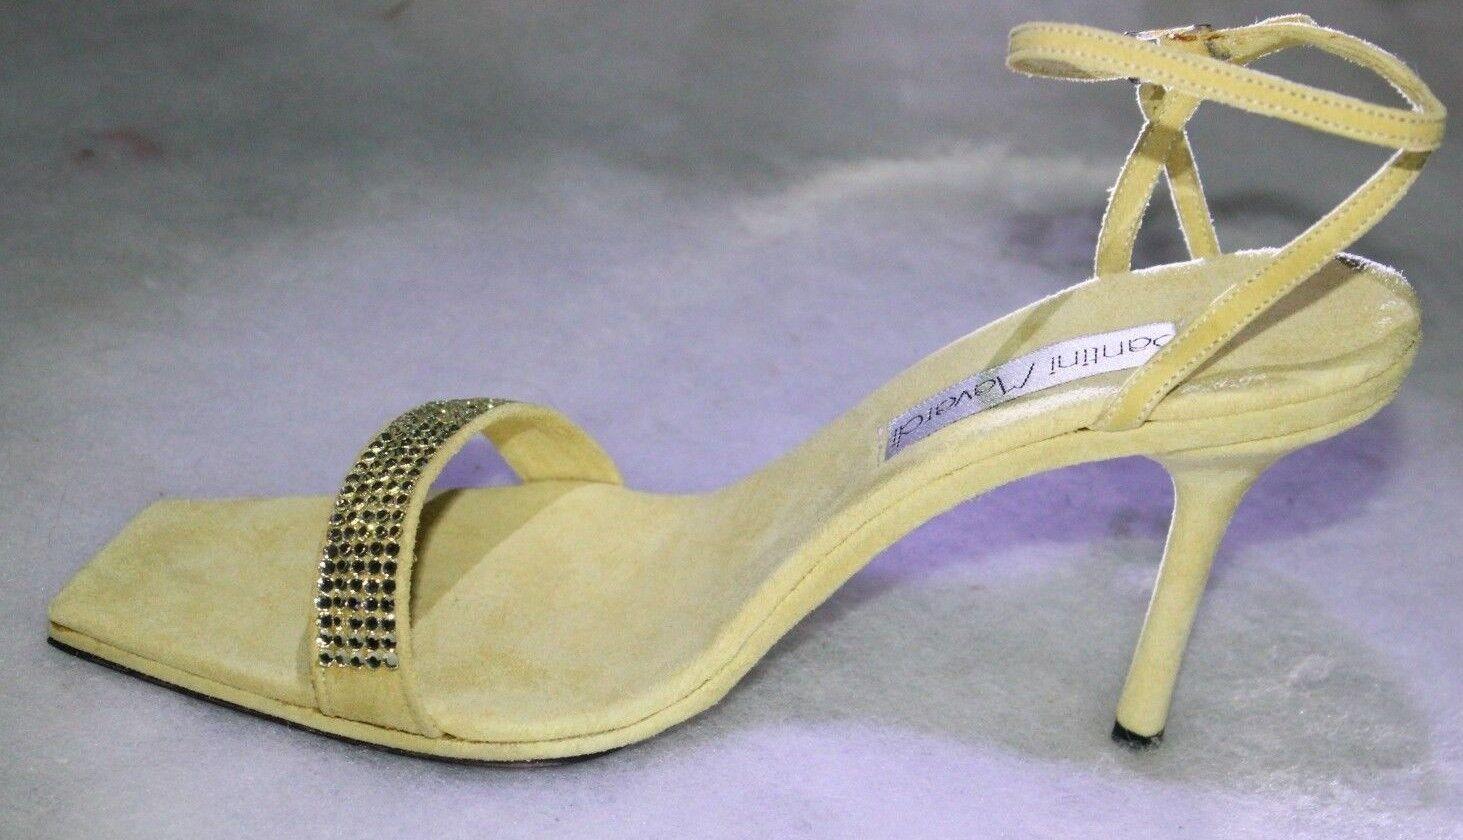 connotazione di lusso low-key Santini Mavardi Carina 5 giallo    Suede jonquil sandals pumps 39 9 7 heels scarpe  qualità ufficiale